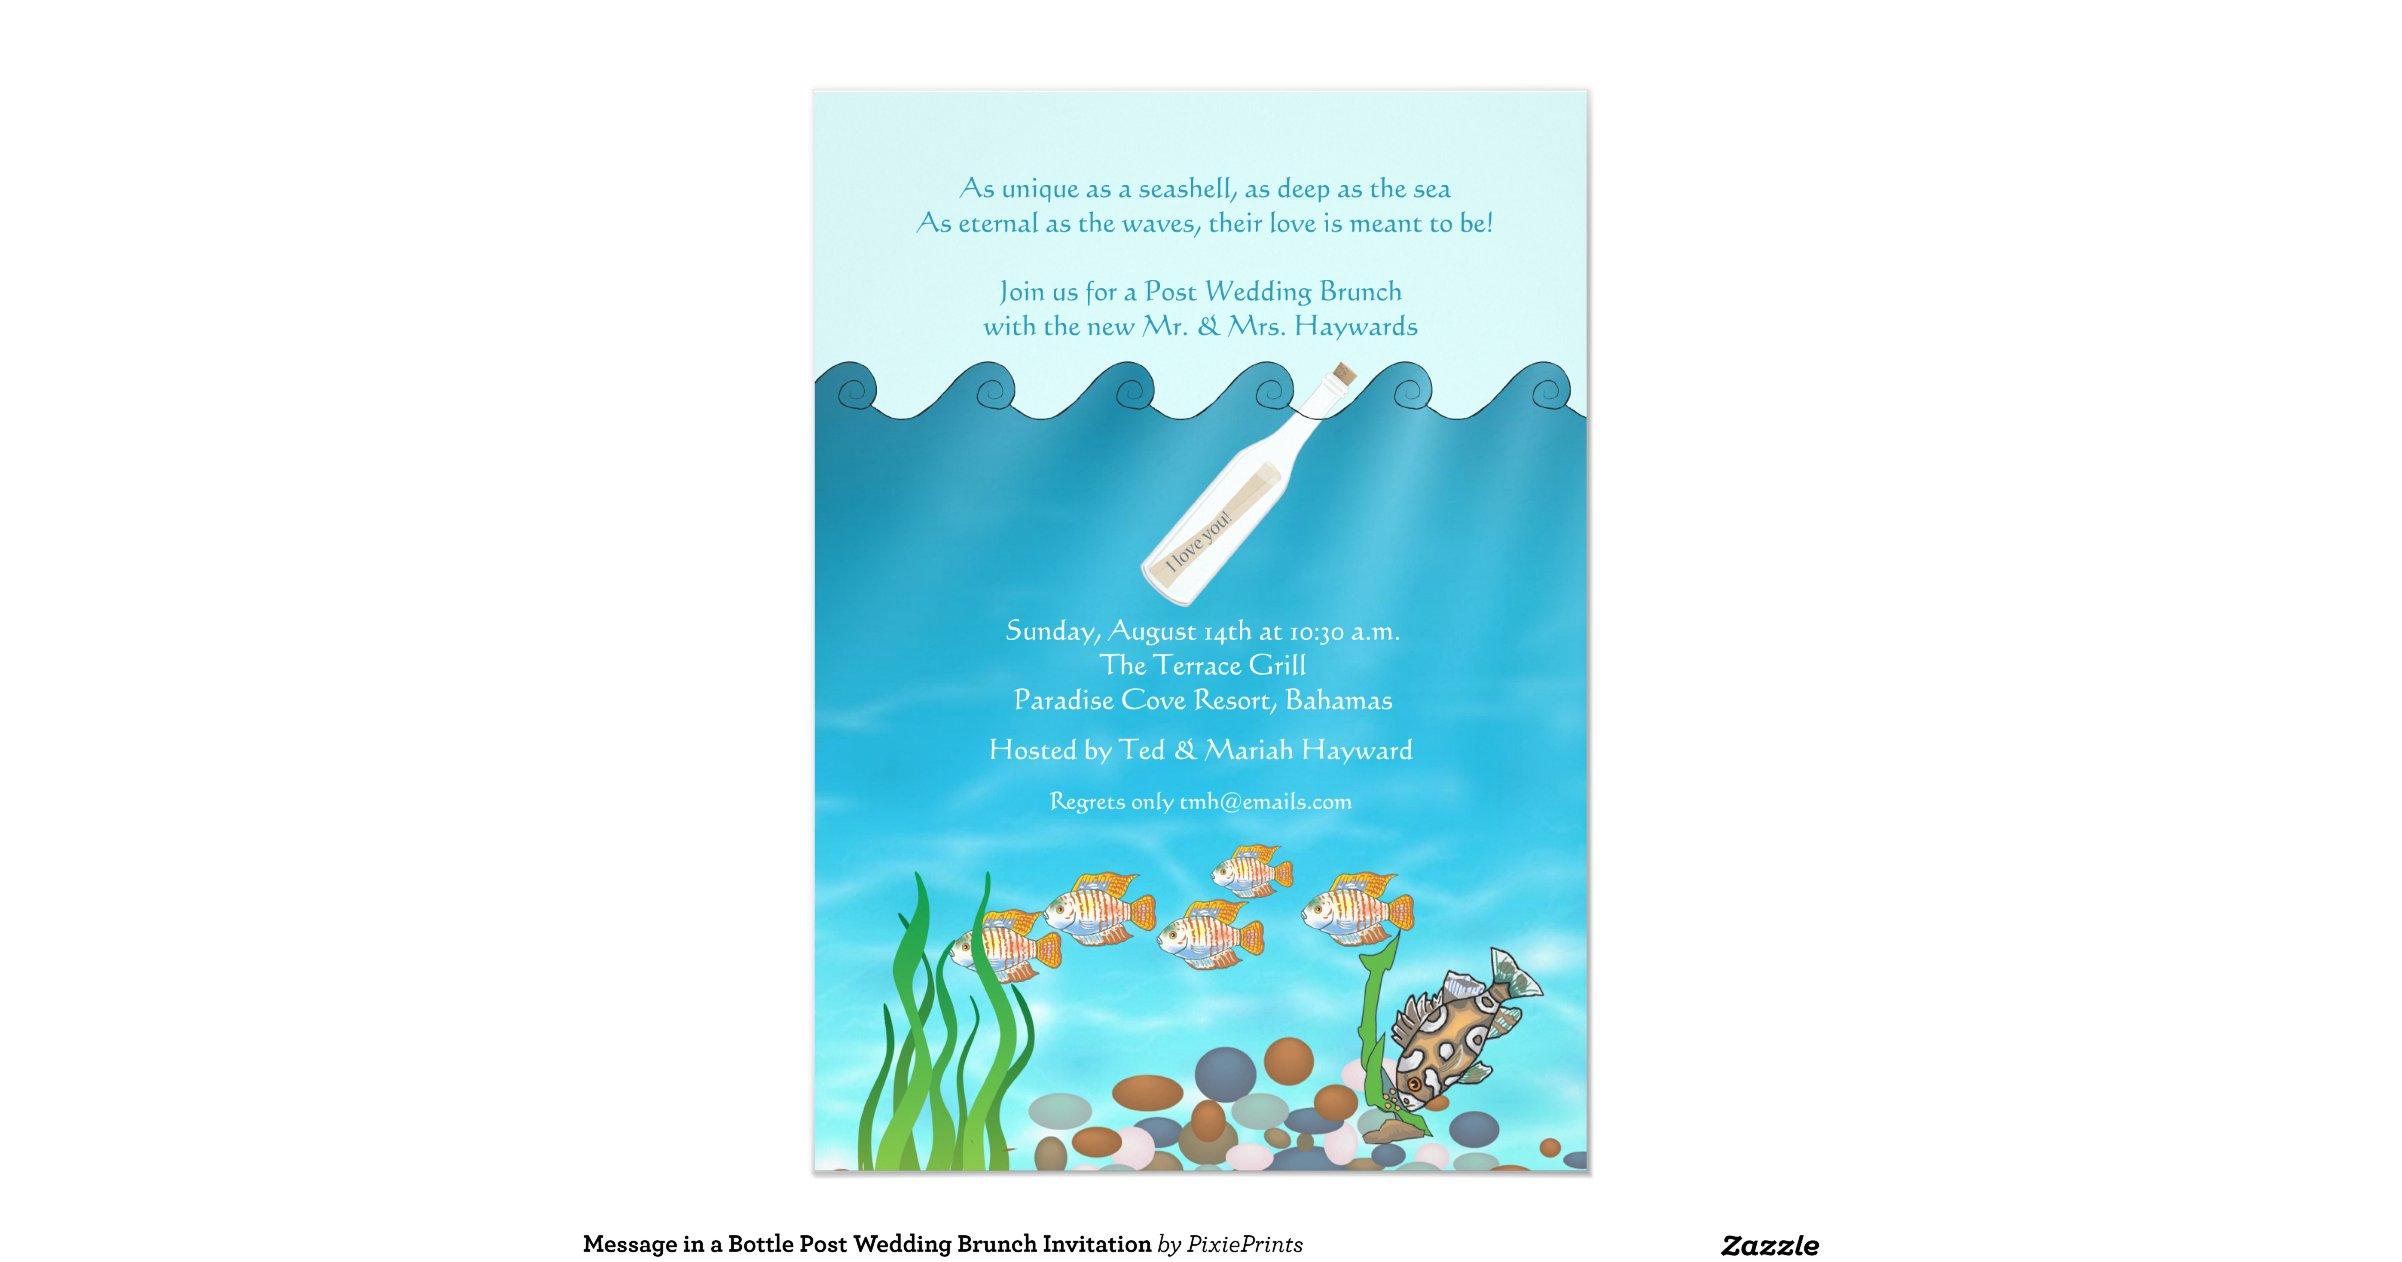 Message In A Bottle Post Wedding Brunch Invitation Rf8629ef8201c406b97965c7f2ead1b32 Zkrqs 1200